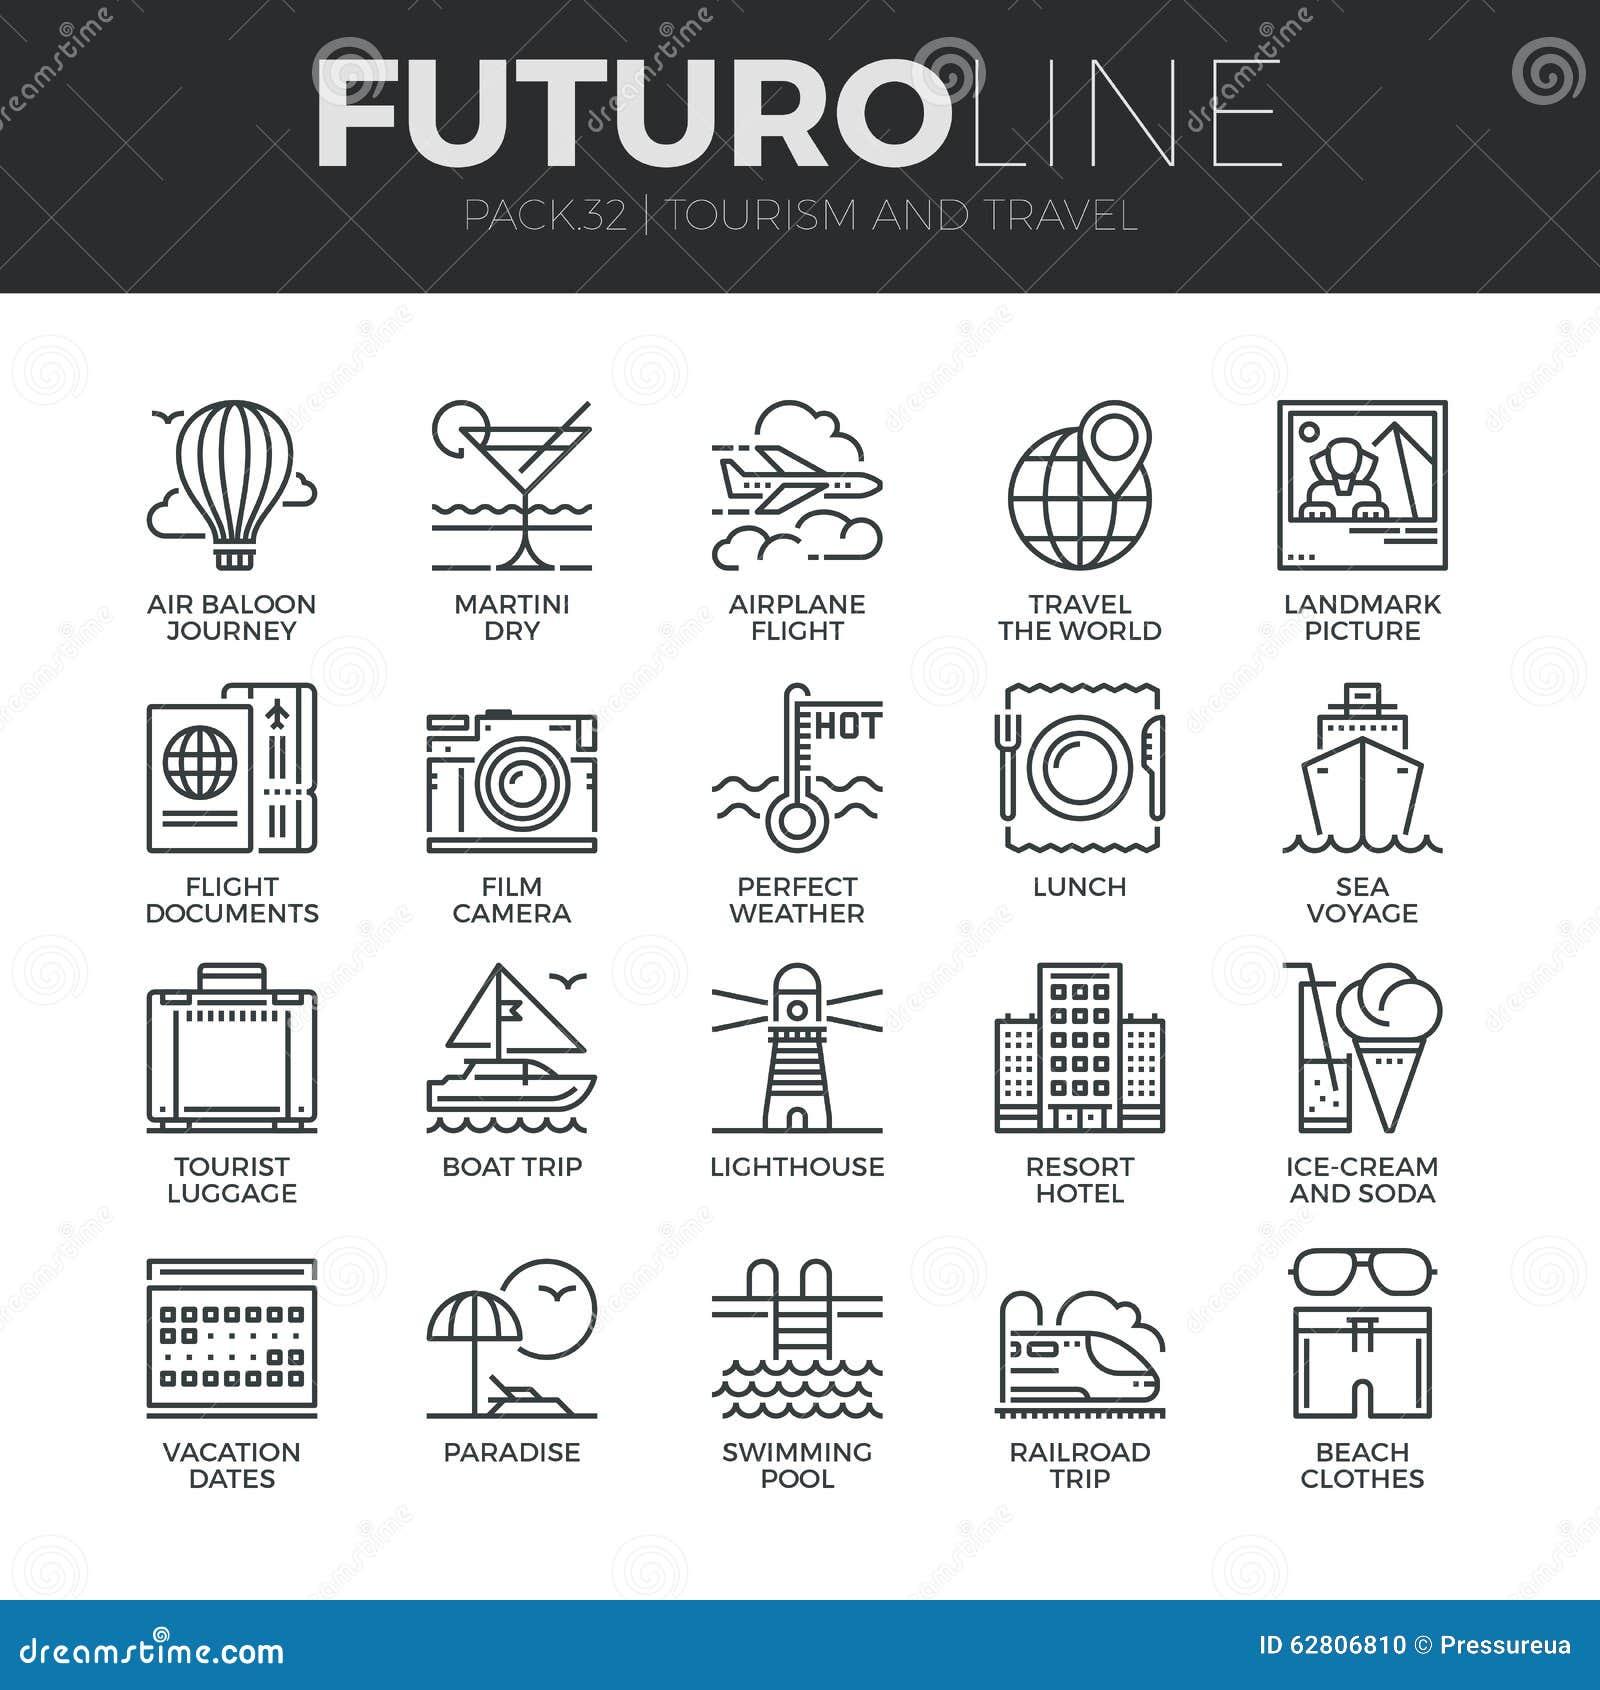 Download Tourism And Travel Futuro Line Icons Set Stock Vector - Illustration of line, landmark: 62806810